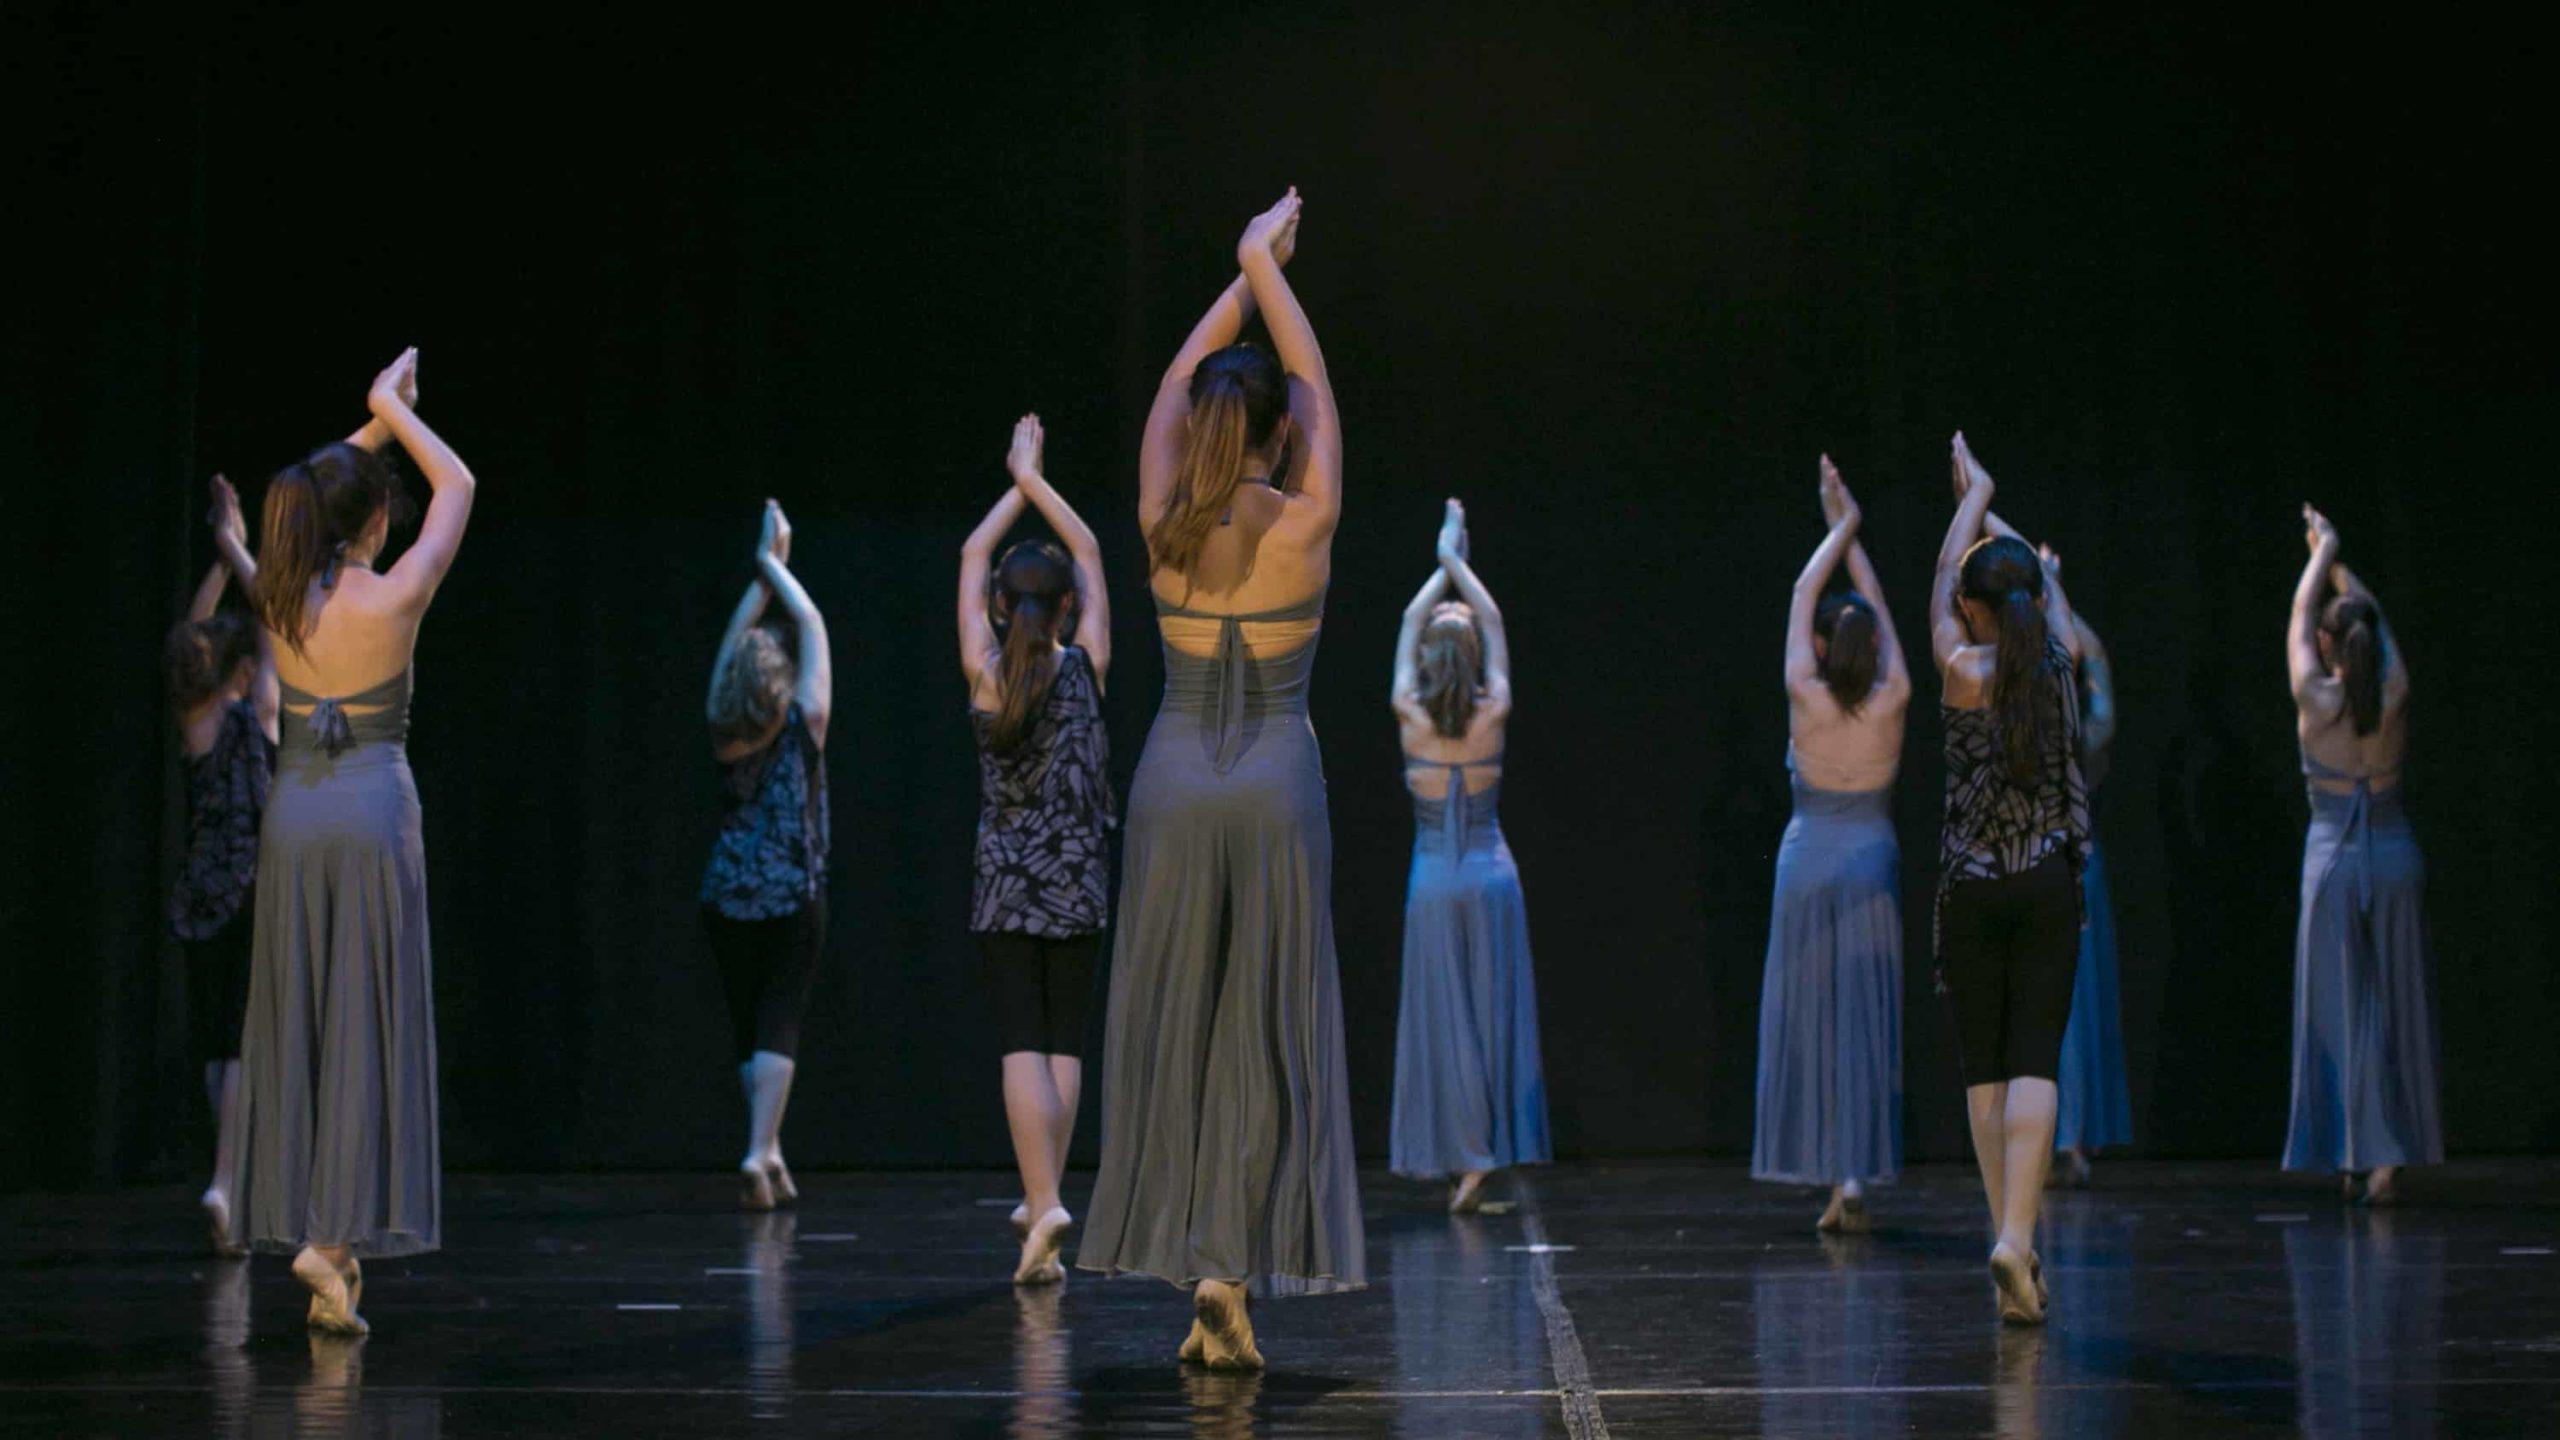 poetar-danzando-14@0.5x